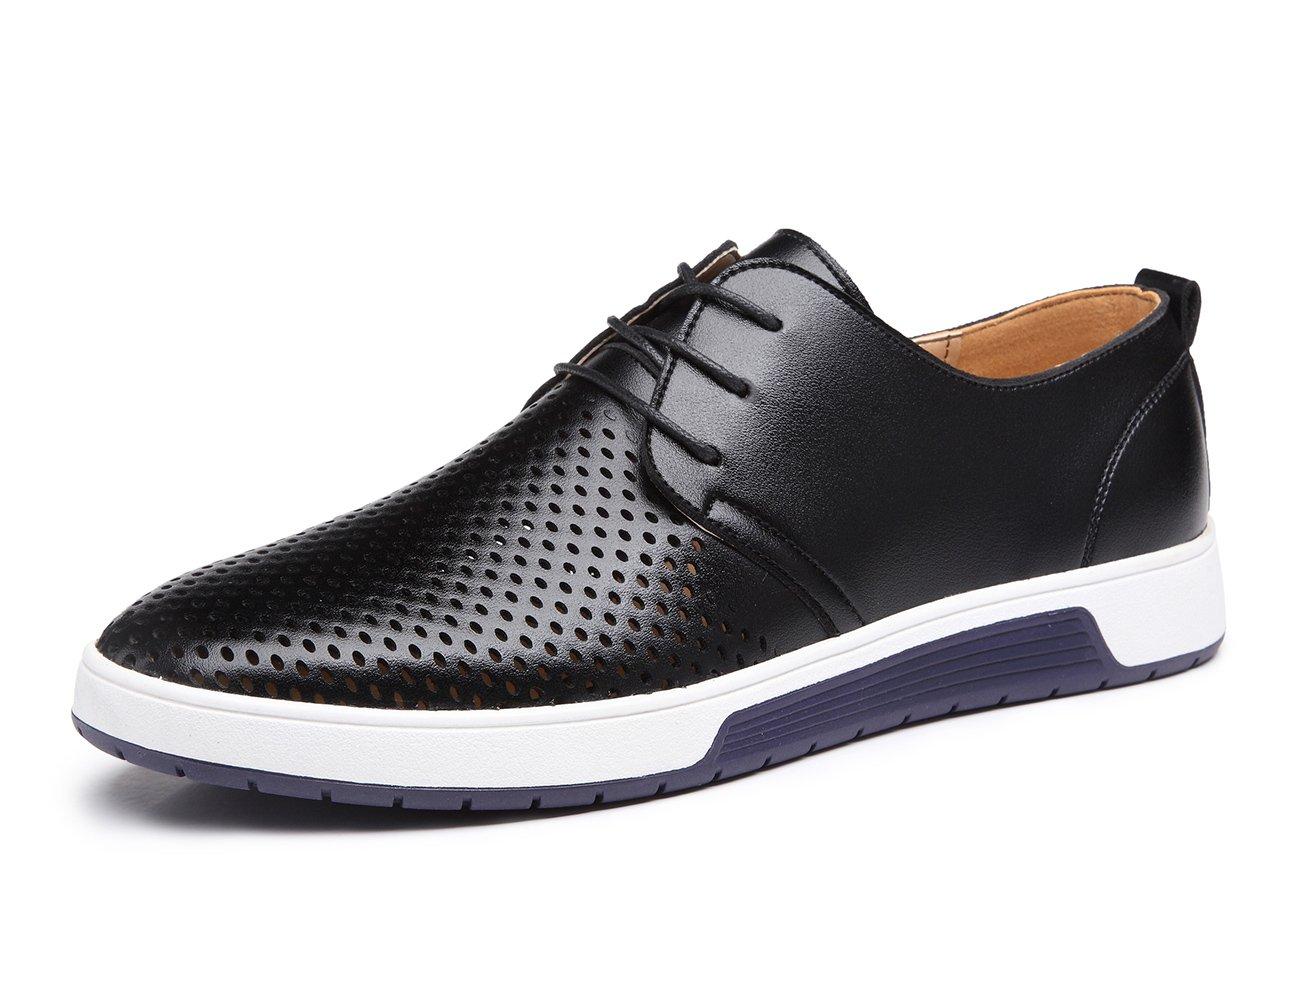 XMWEALTHY Men's British Style Breathable Flat Dress Shoes Black US 12